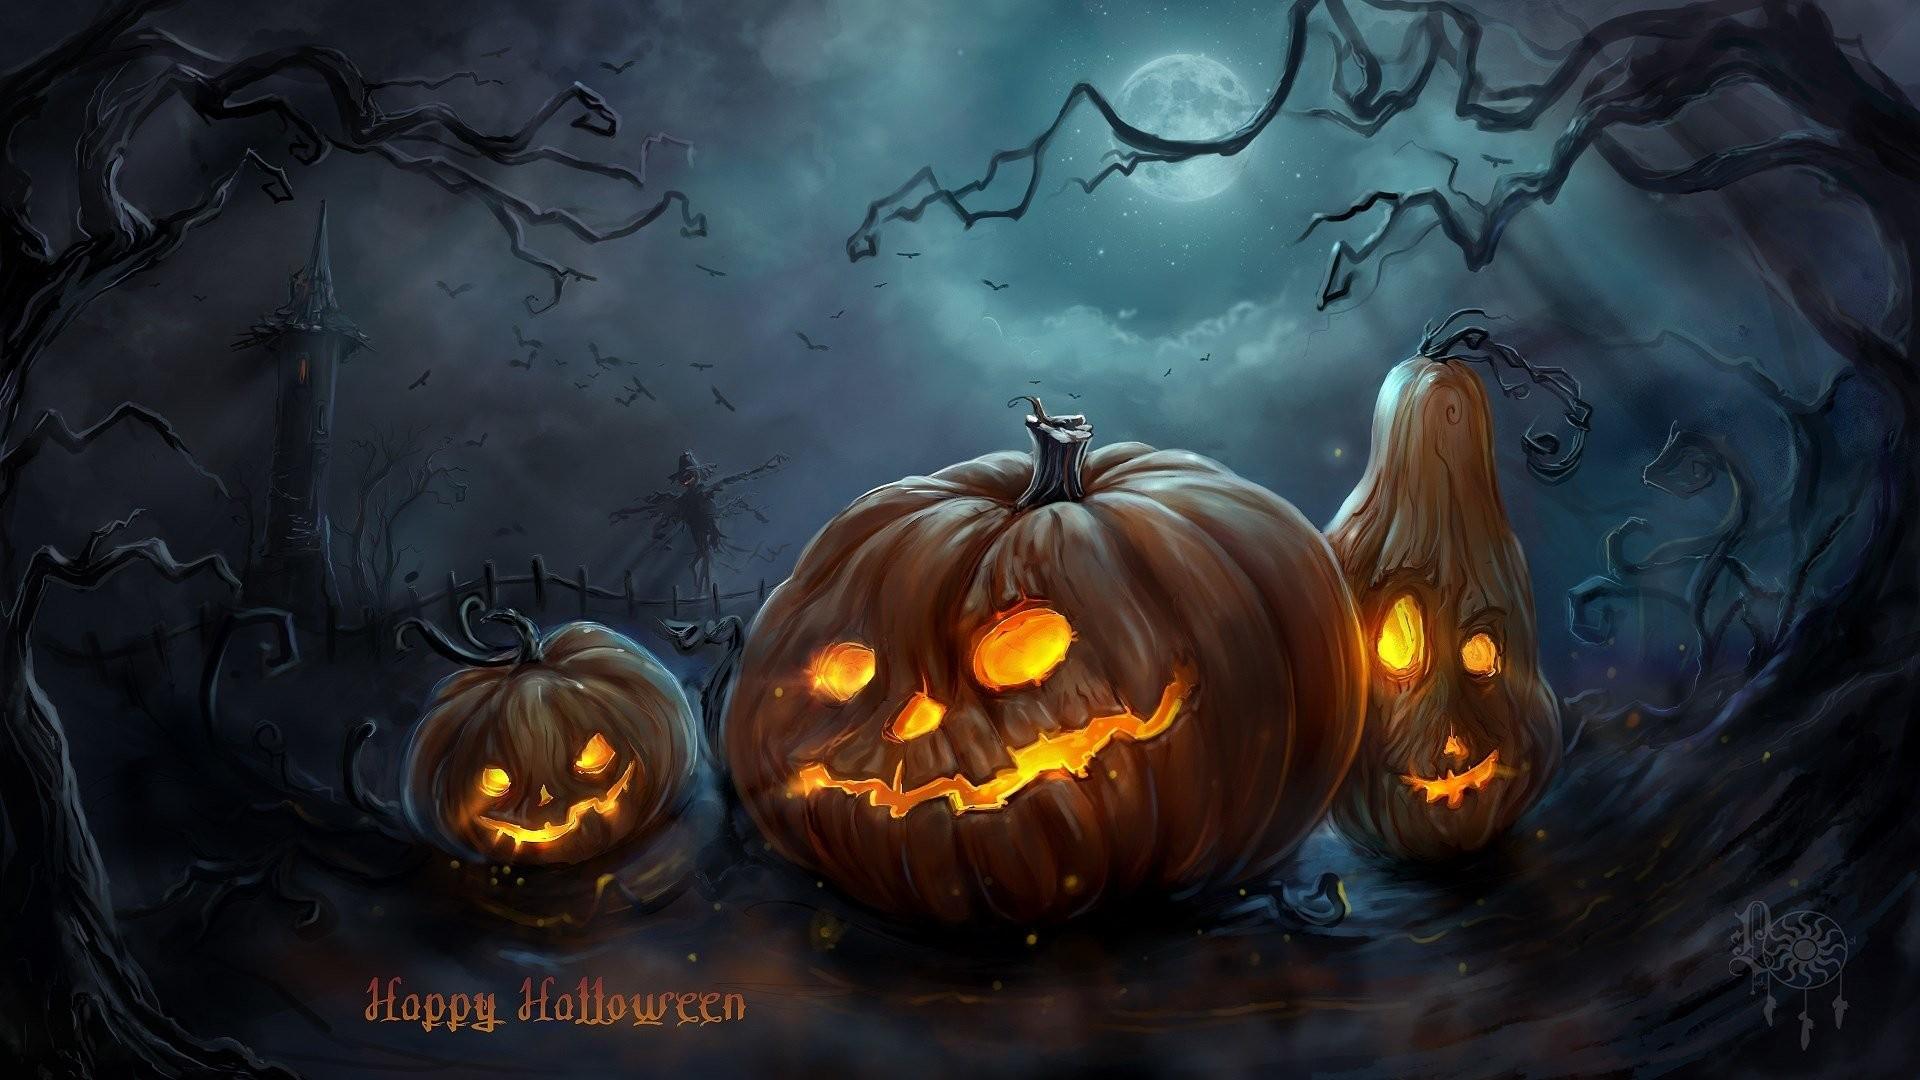 Wonderful Wallpaper Halloween Tablet - 269314-download-halloween-background-1920x1080-tablet  Photograph_6776.jpg